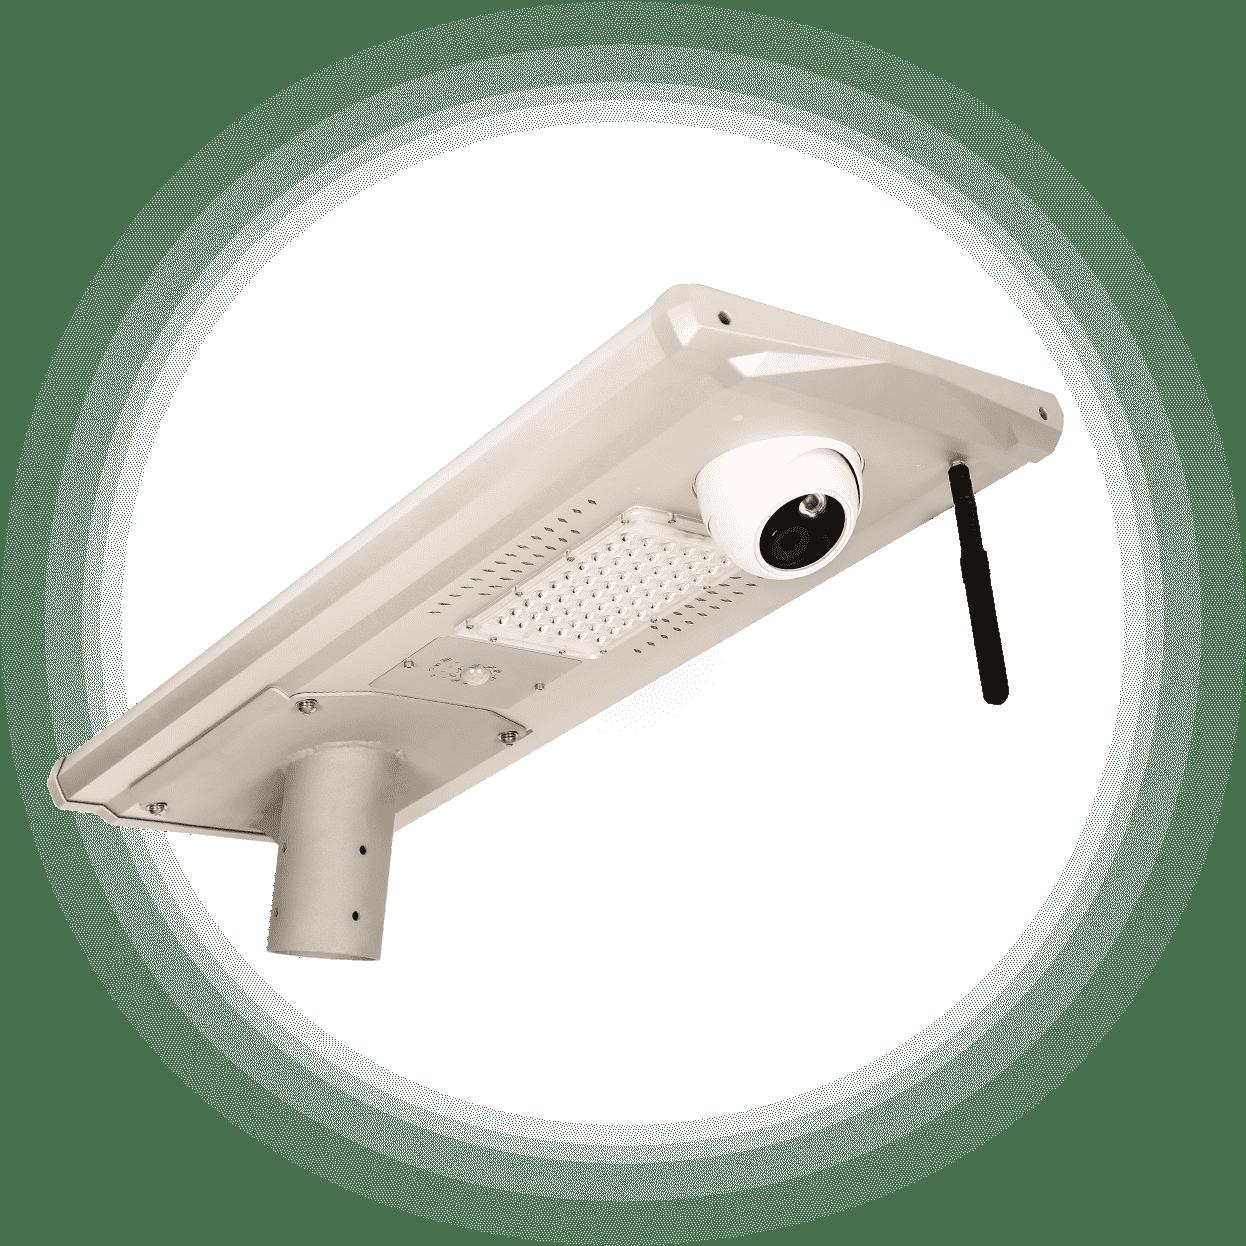 Luxman-light-inner-page-design-LX-LD30W-S3C-solar-lights-security-camera